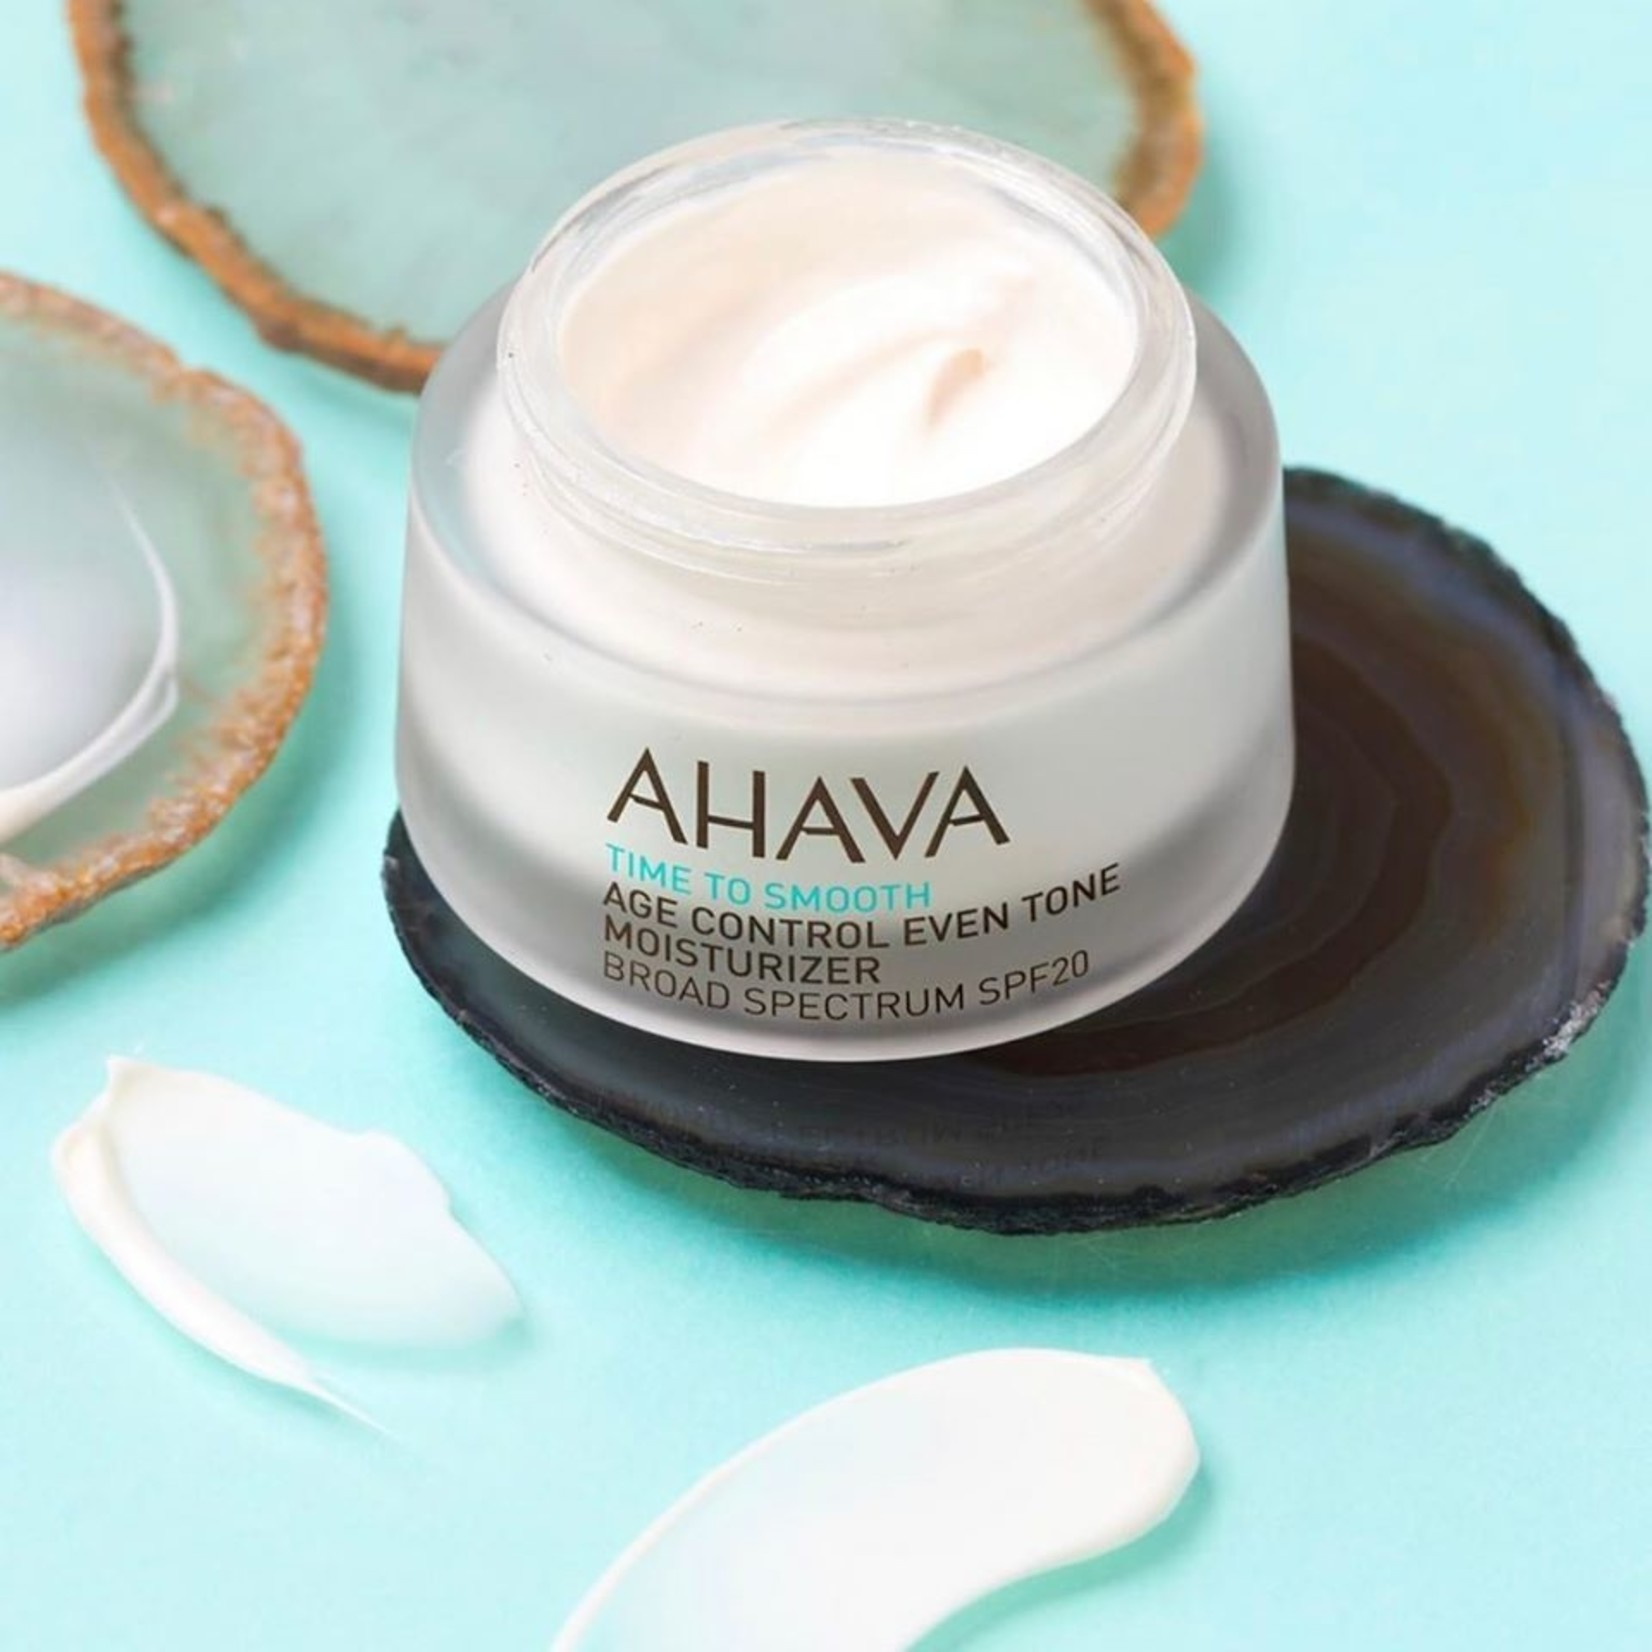 AHAVA Age control even tone moisturizer SPF 20 50ml